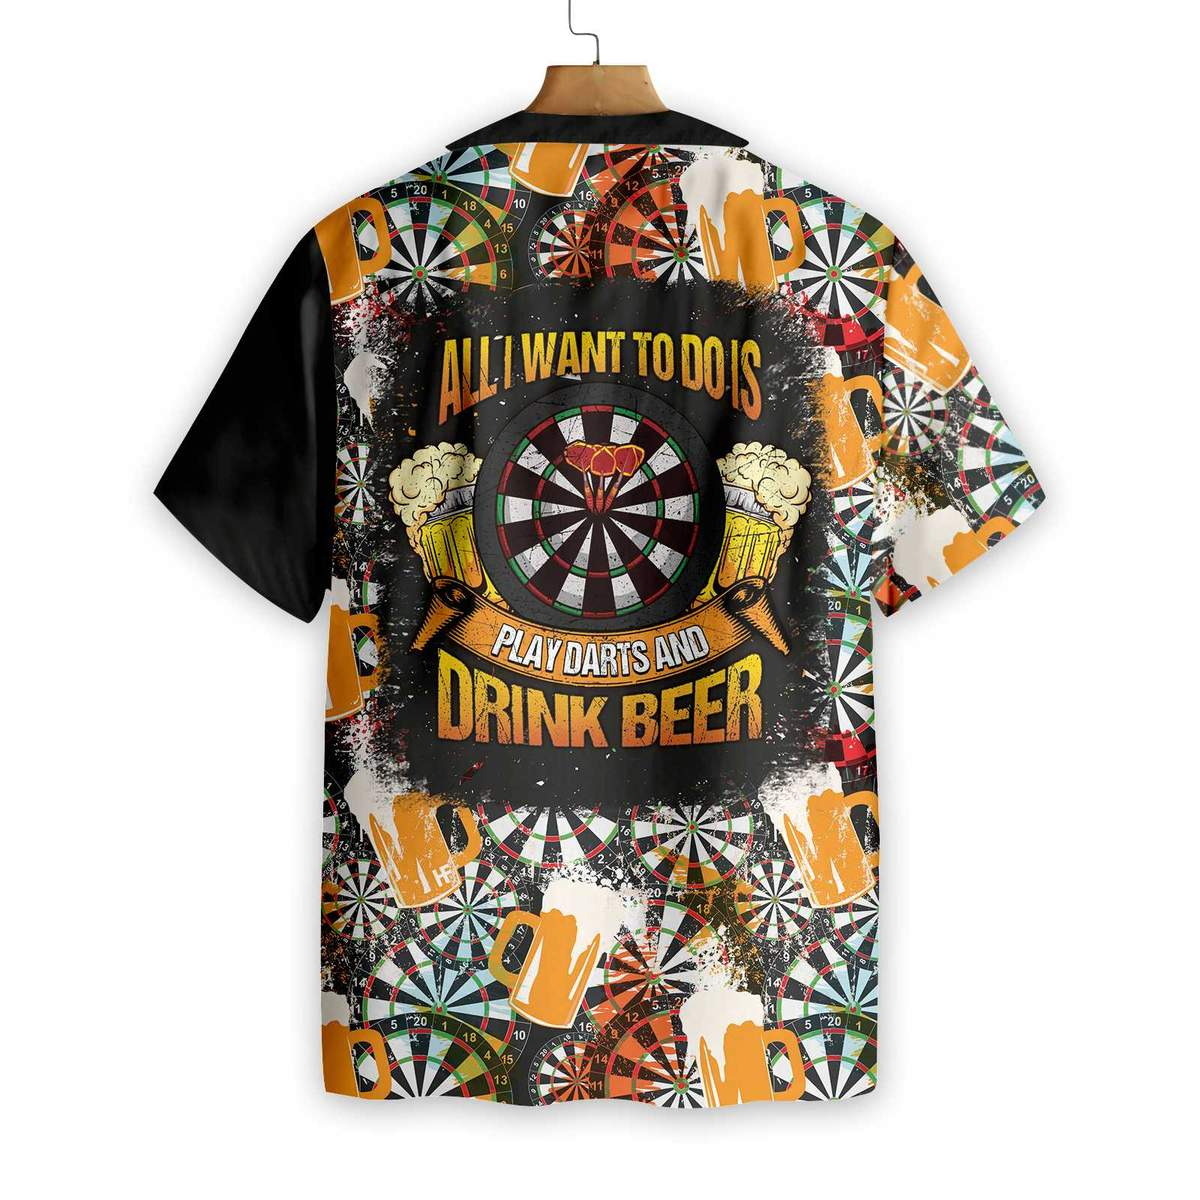 Play Darts And Drink Beer V1 Hawaiian Shirt1